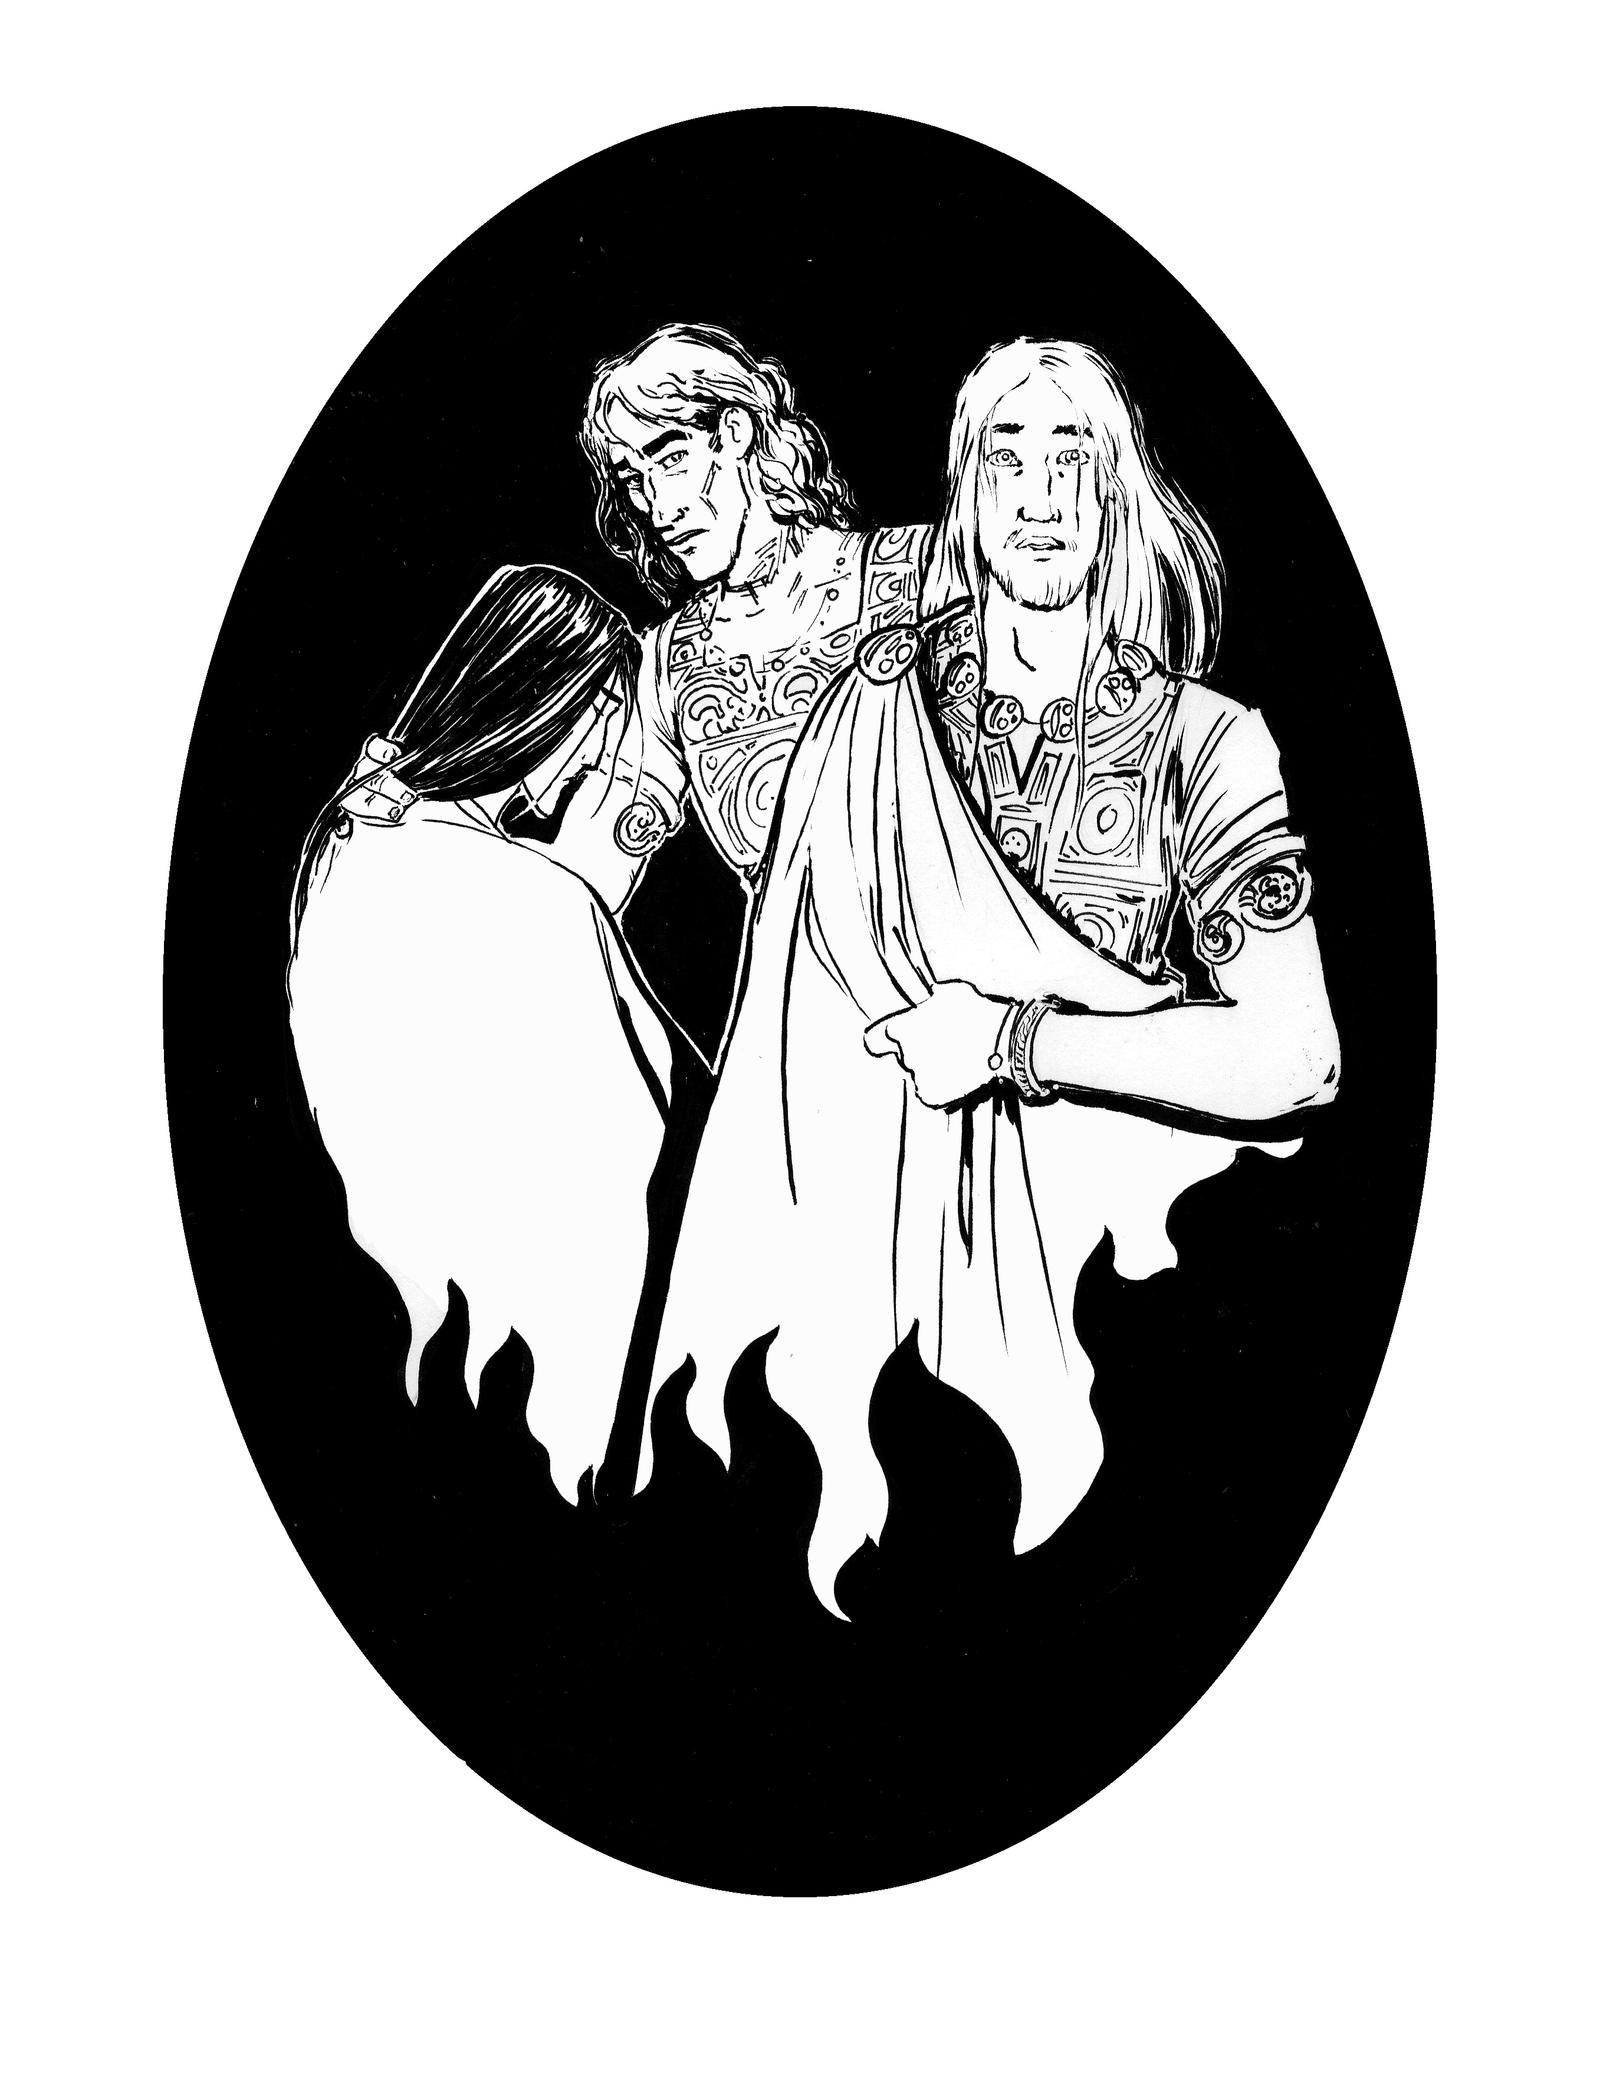 Ashkr and Solmundr